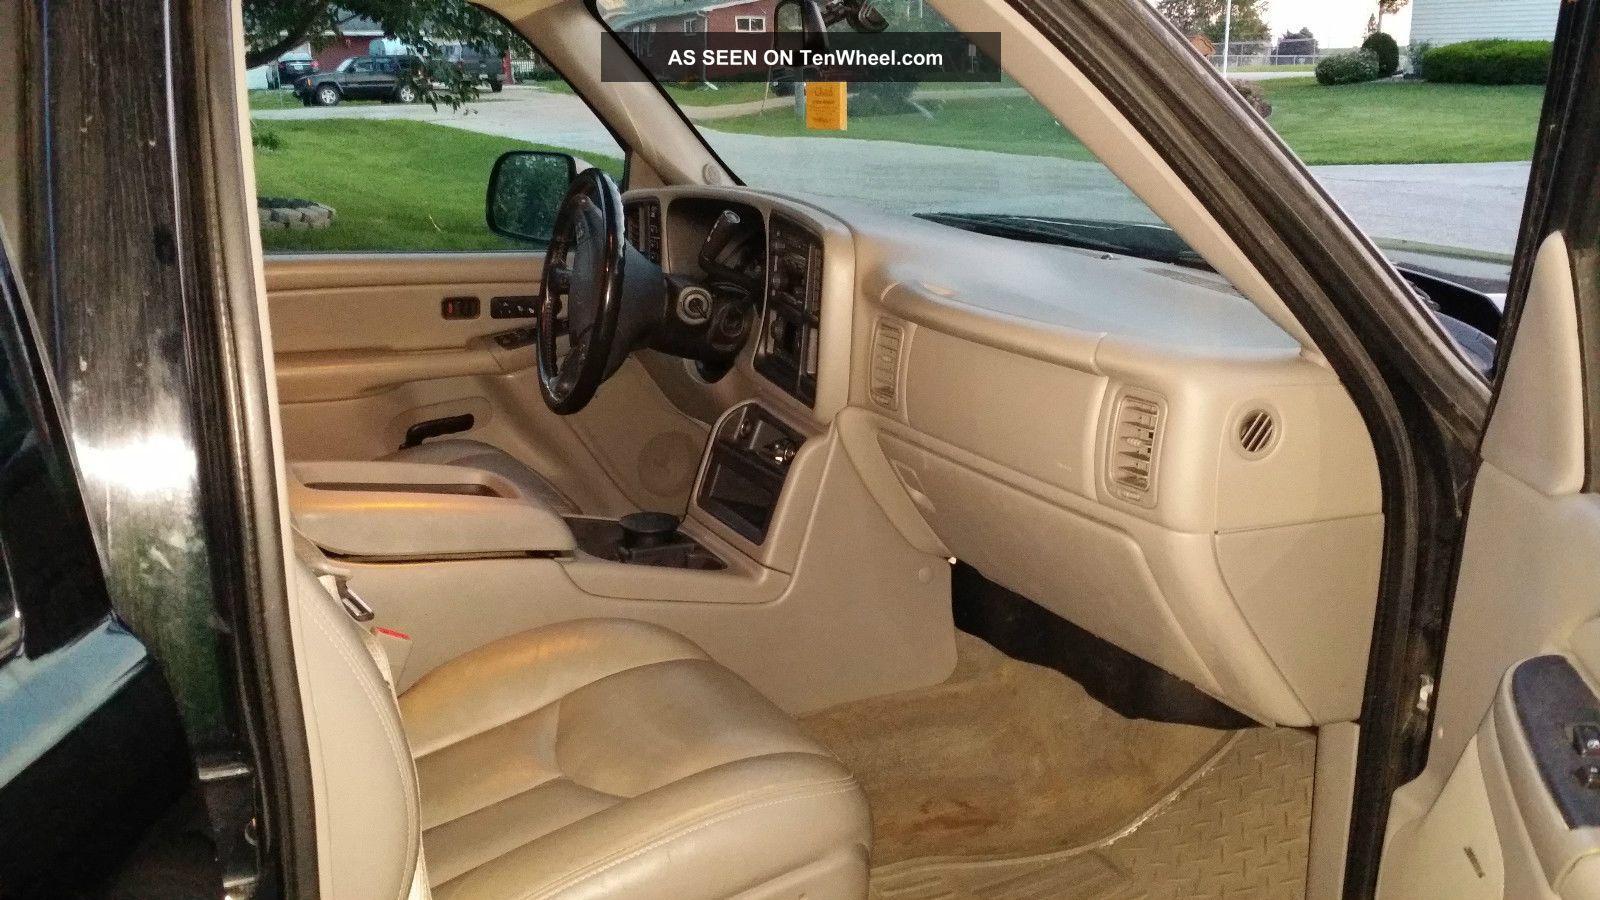 Home » 2014 Dodge Slt Crew Cab Diesel Dually Price